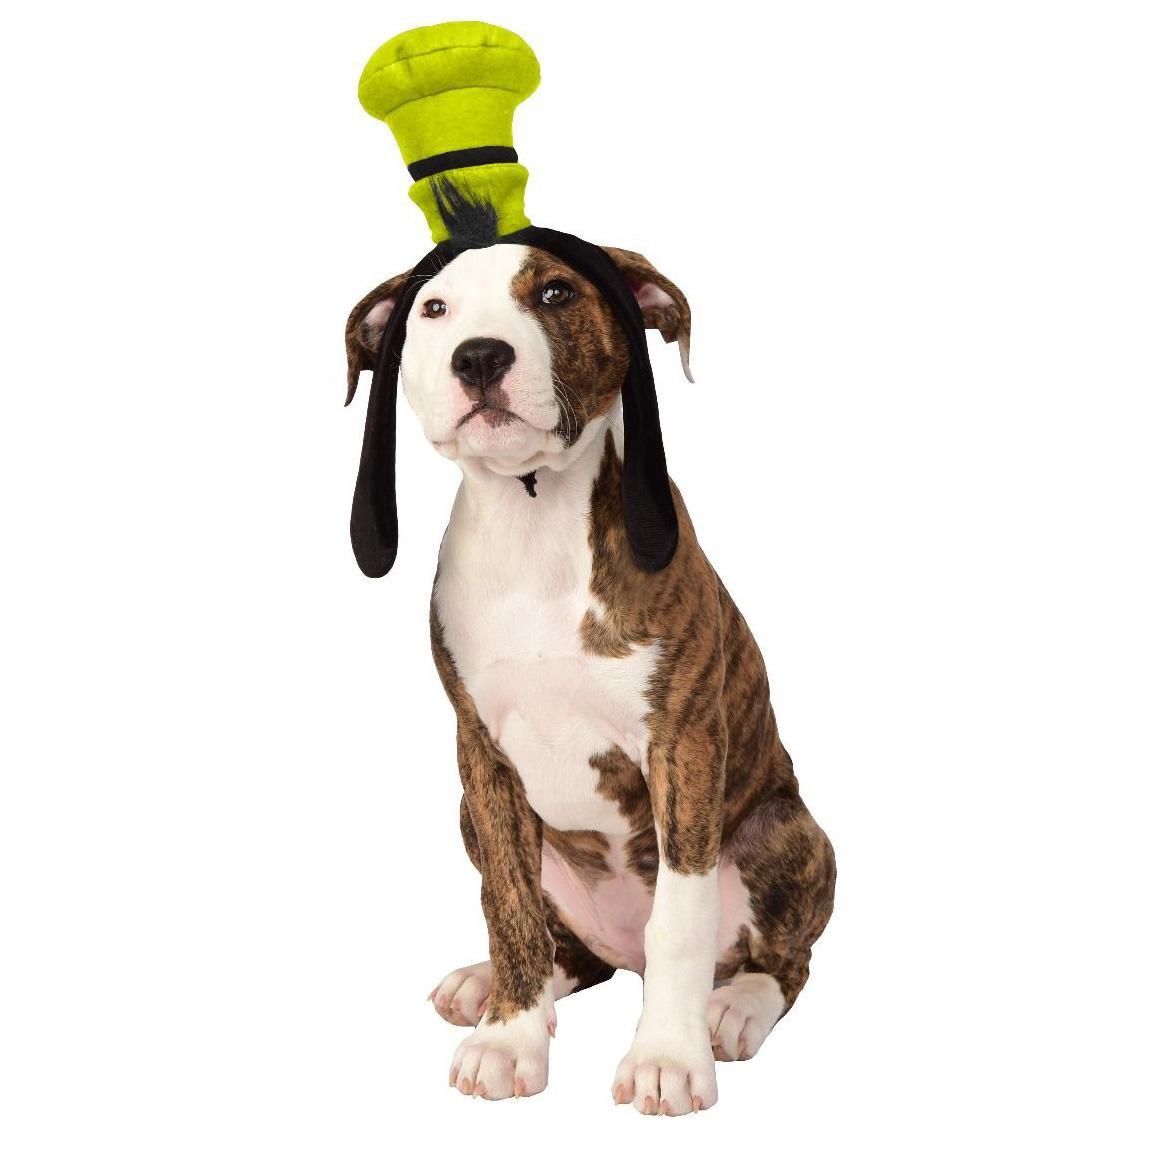 Disney Goofy Headpiece Dog Costume by Rubies